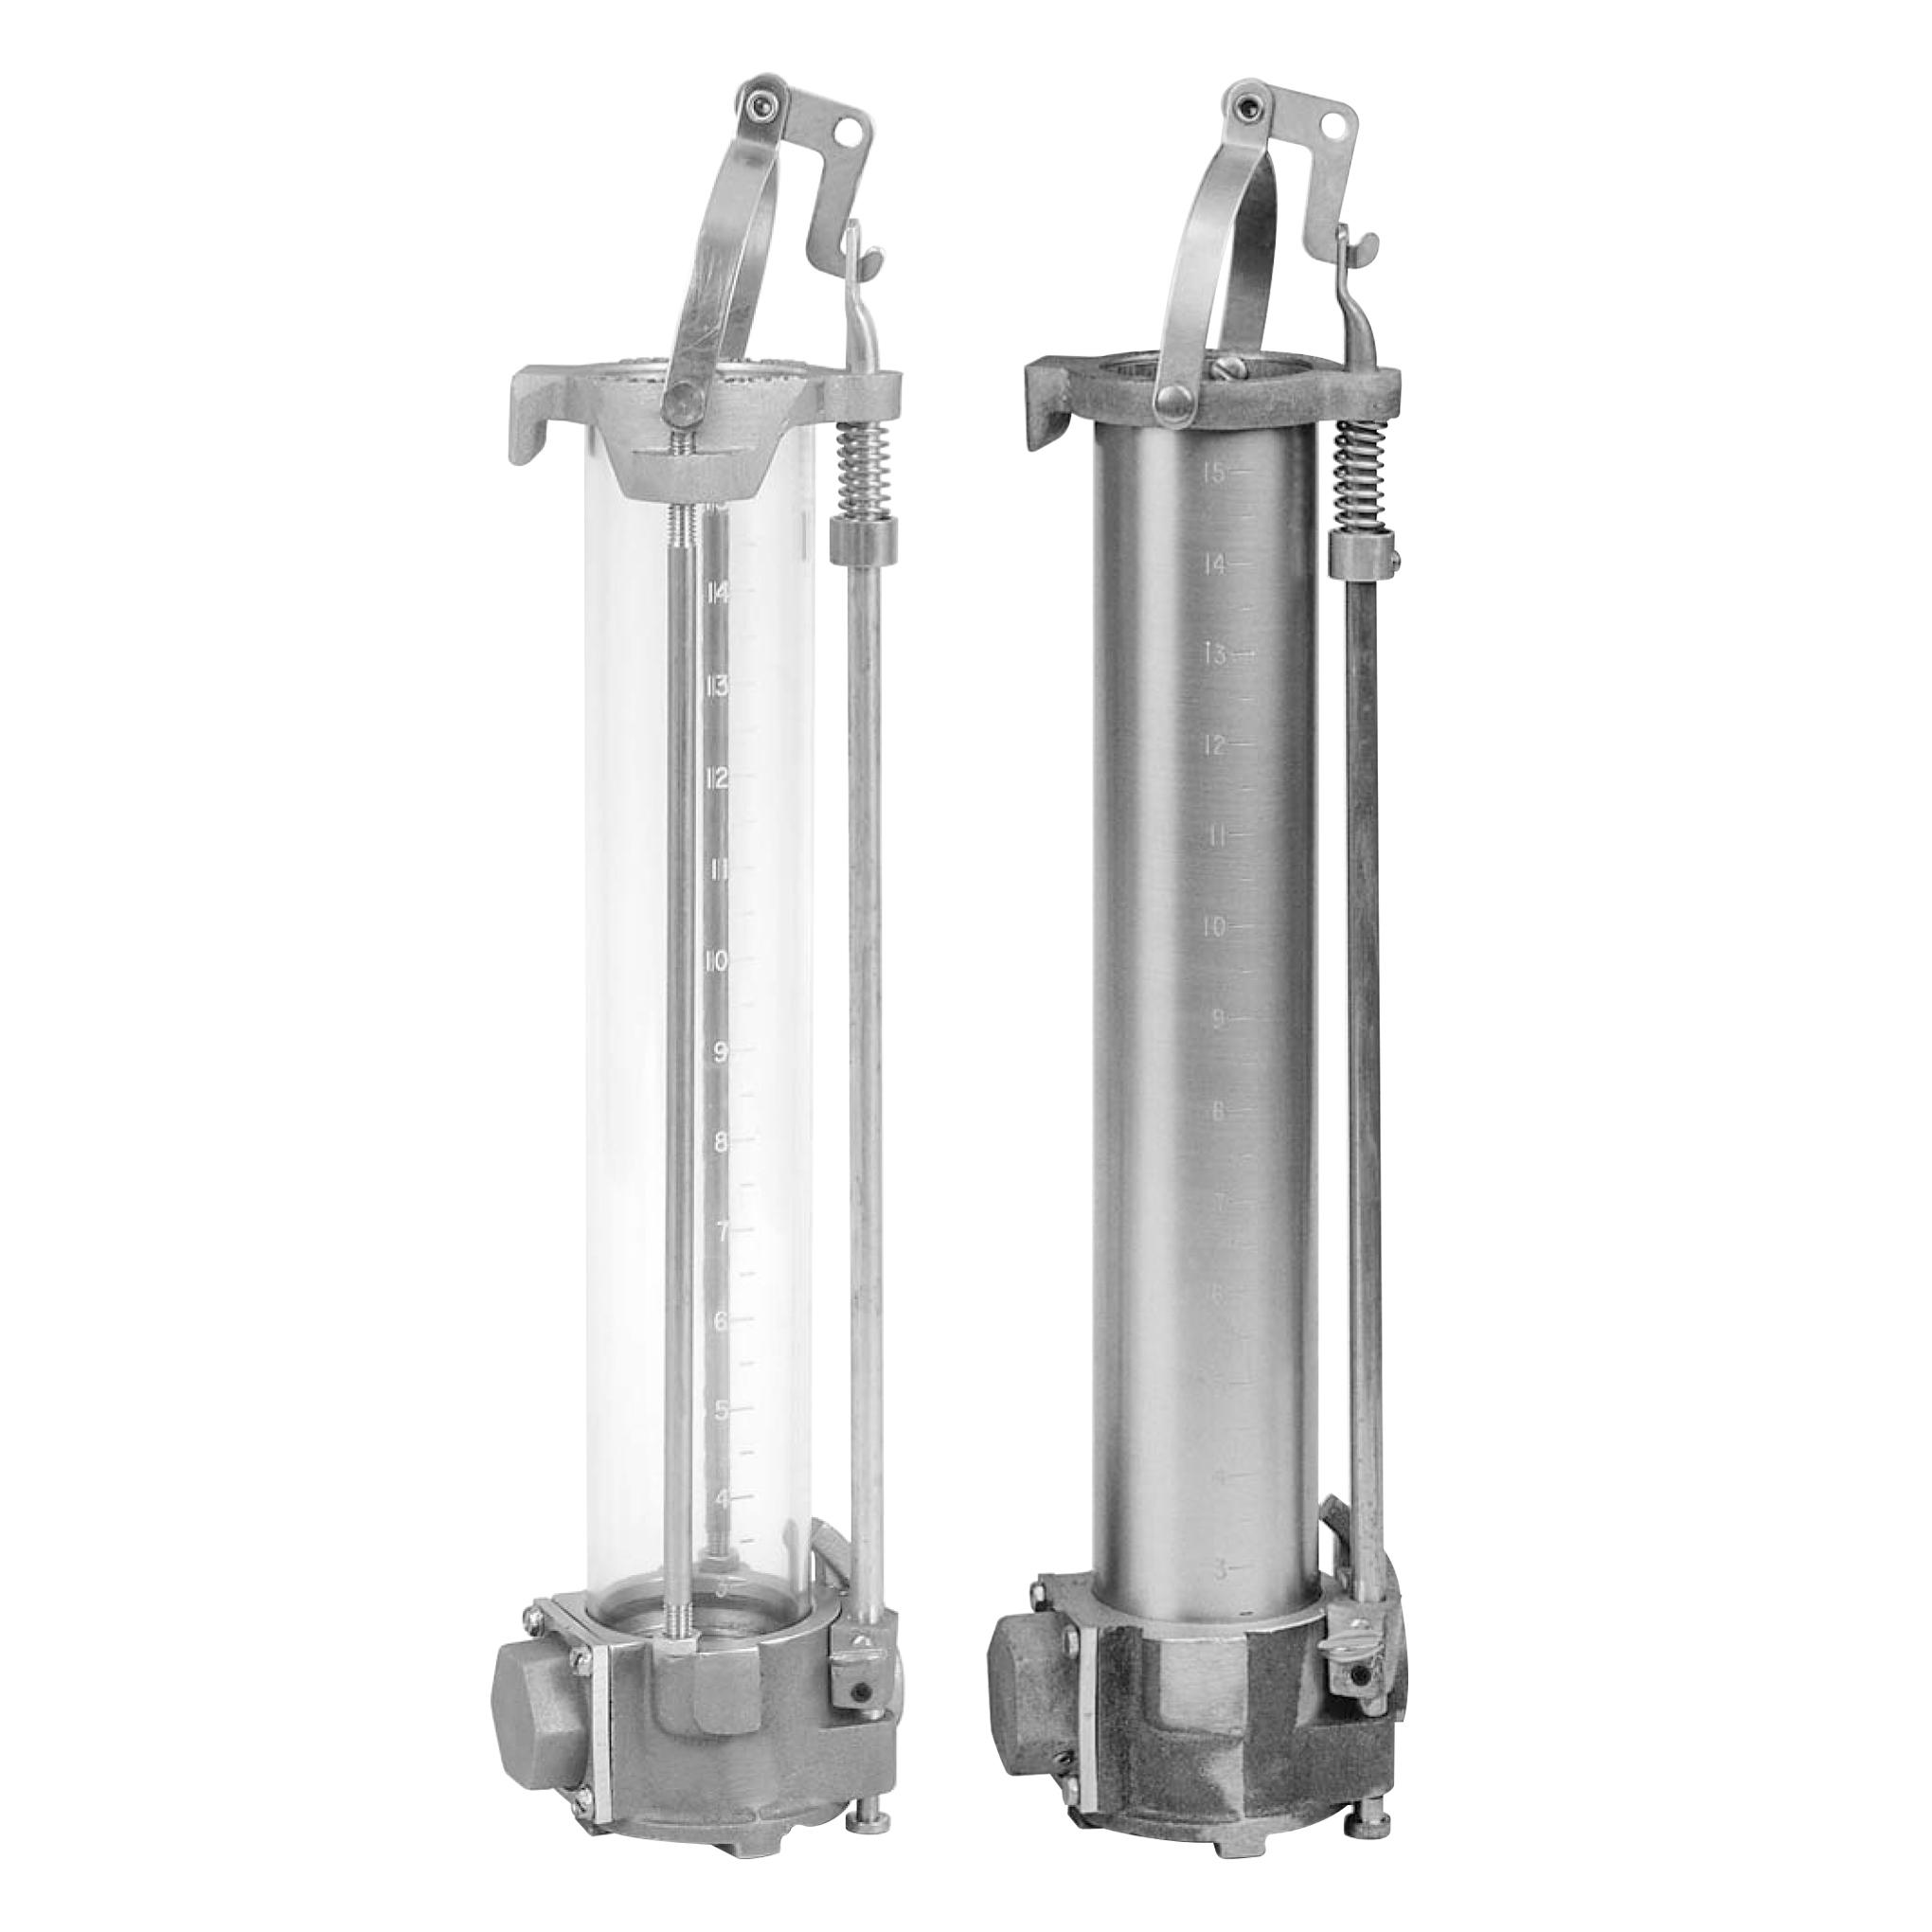 Crude Oil Sampling and Testing Kit | ICL Calibration